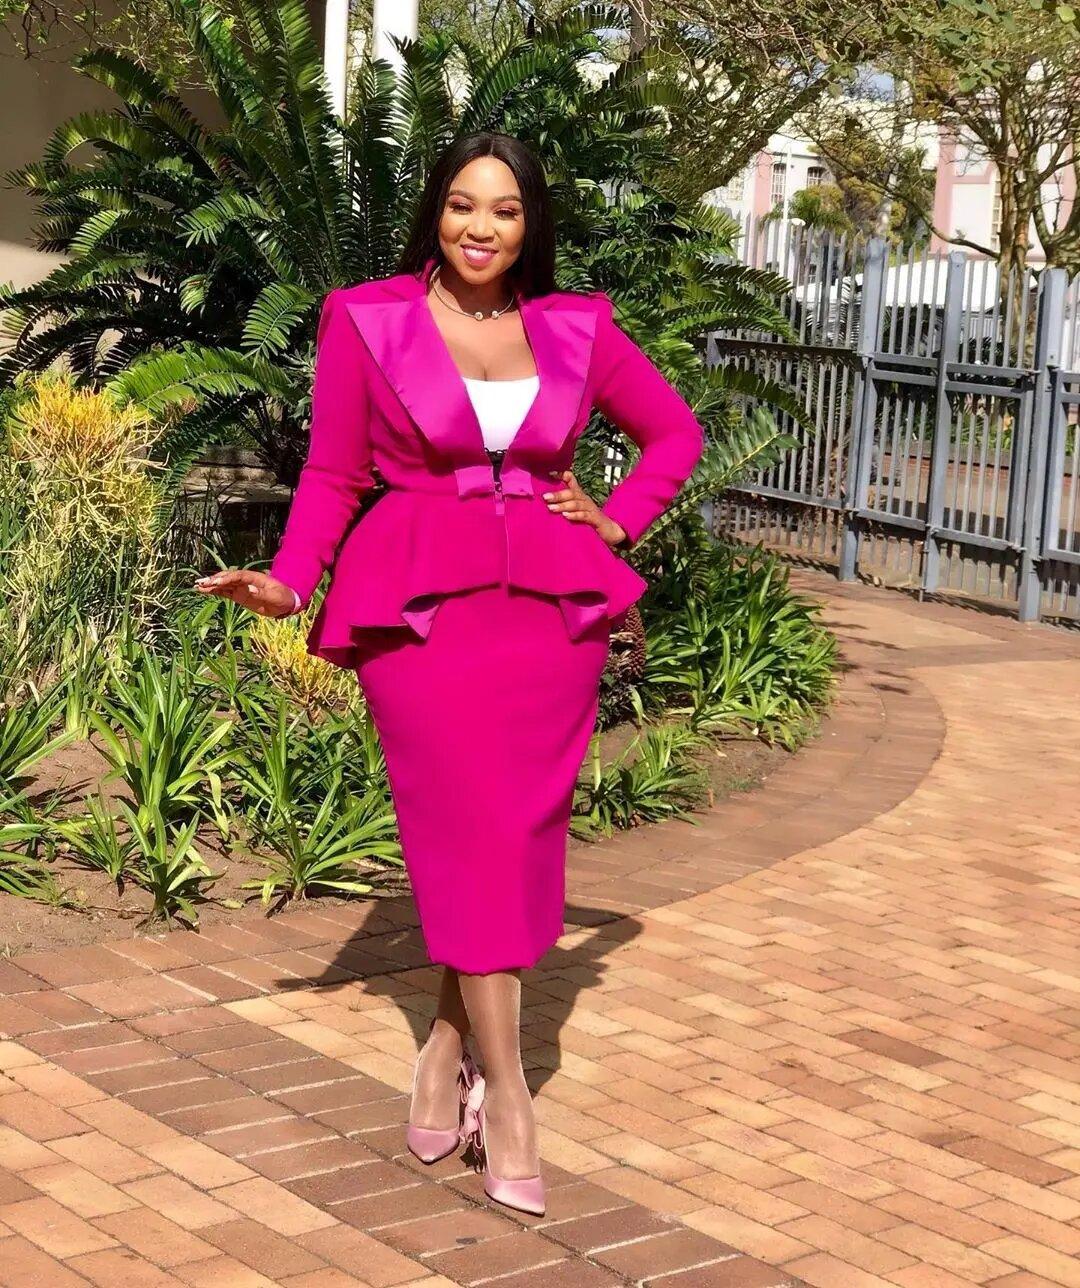 ayanda-ncwane-13-haute-ways-to-rock-your-hot-pink-like-a-style-star